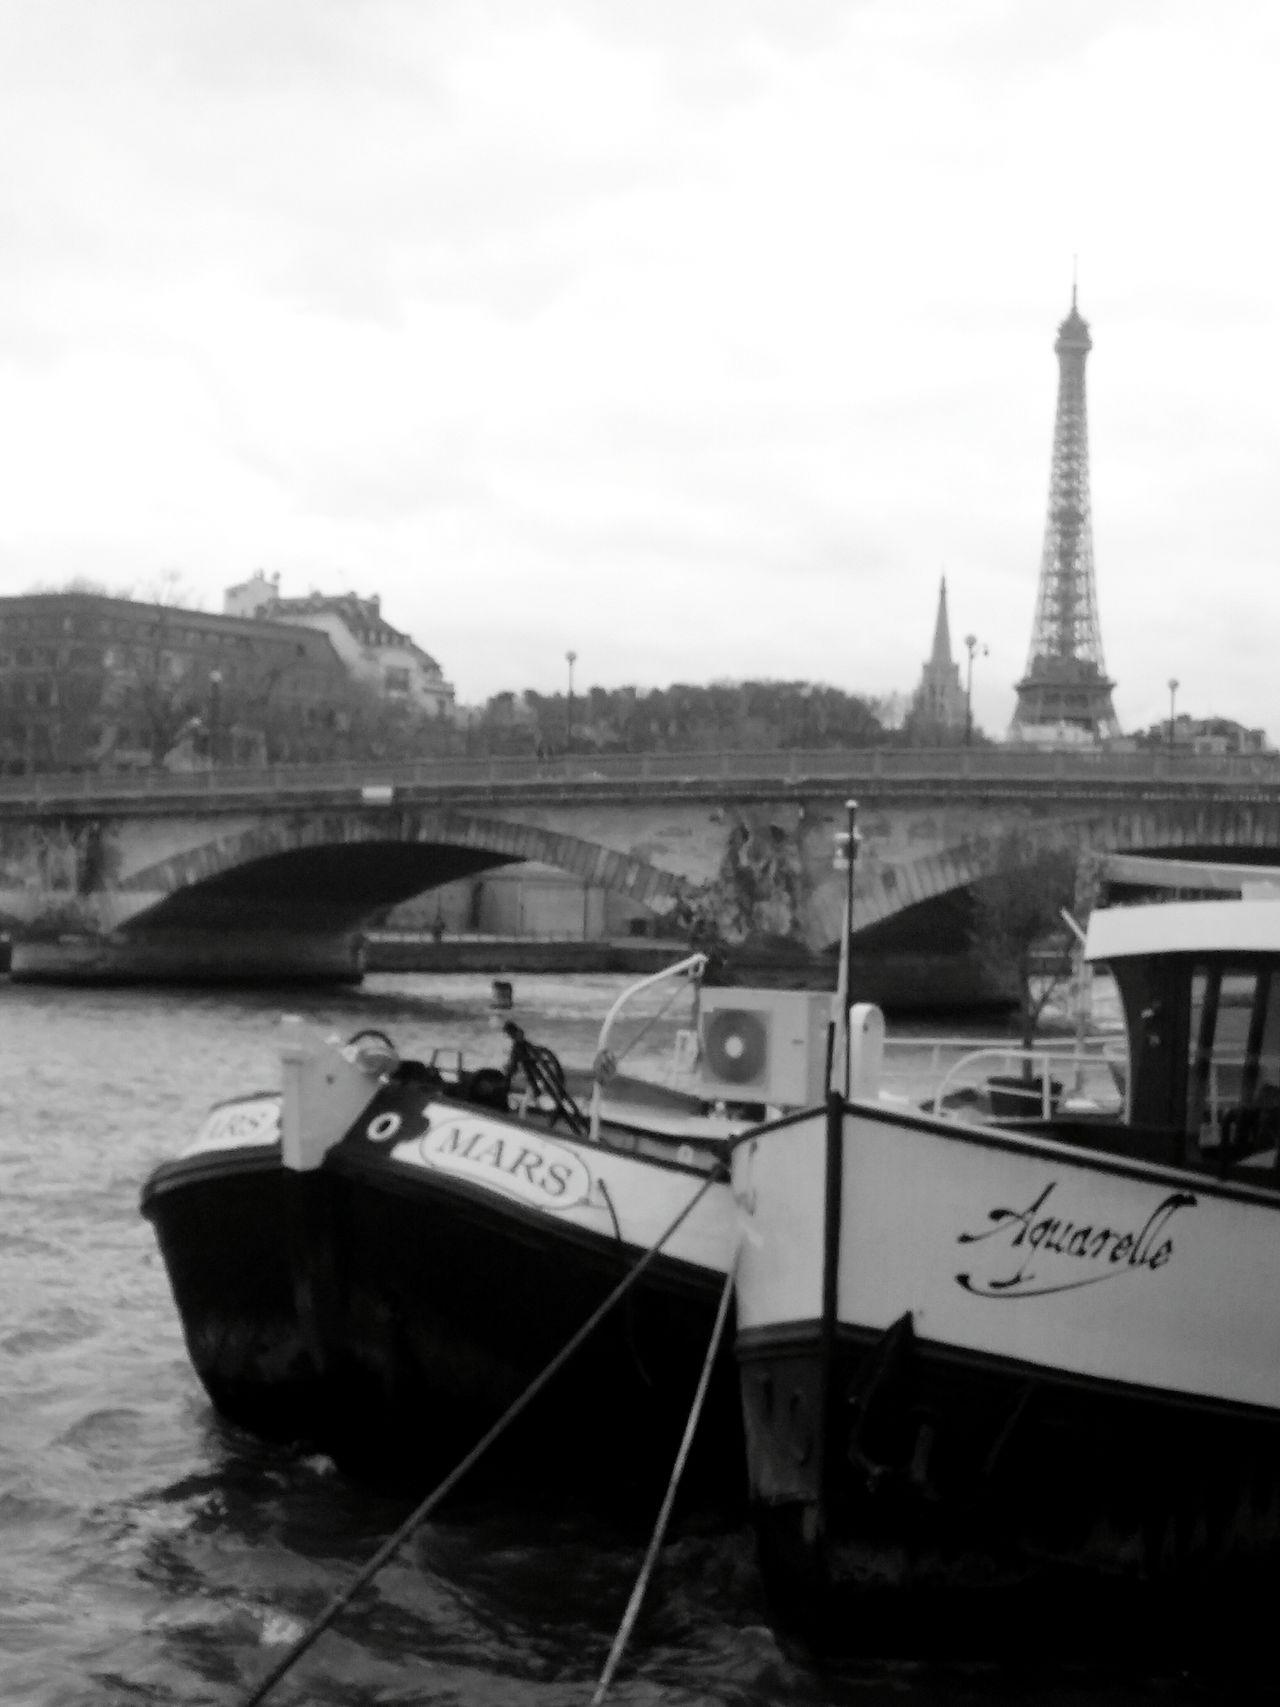 Eiffel Tower Travel Destinations LGG3 Monochromatic LGg3photography EyeEm Best Shots Paris. Water France🇫🇷